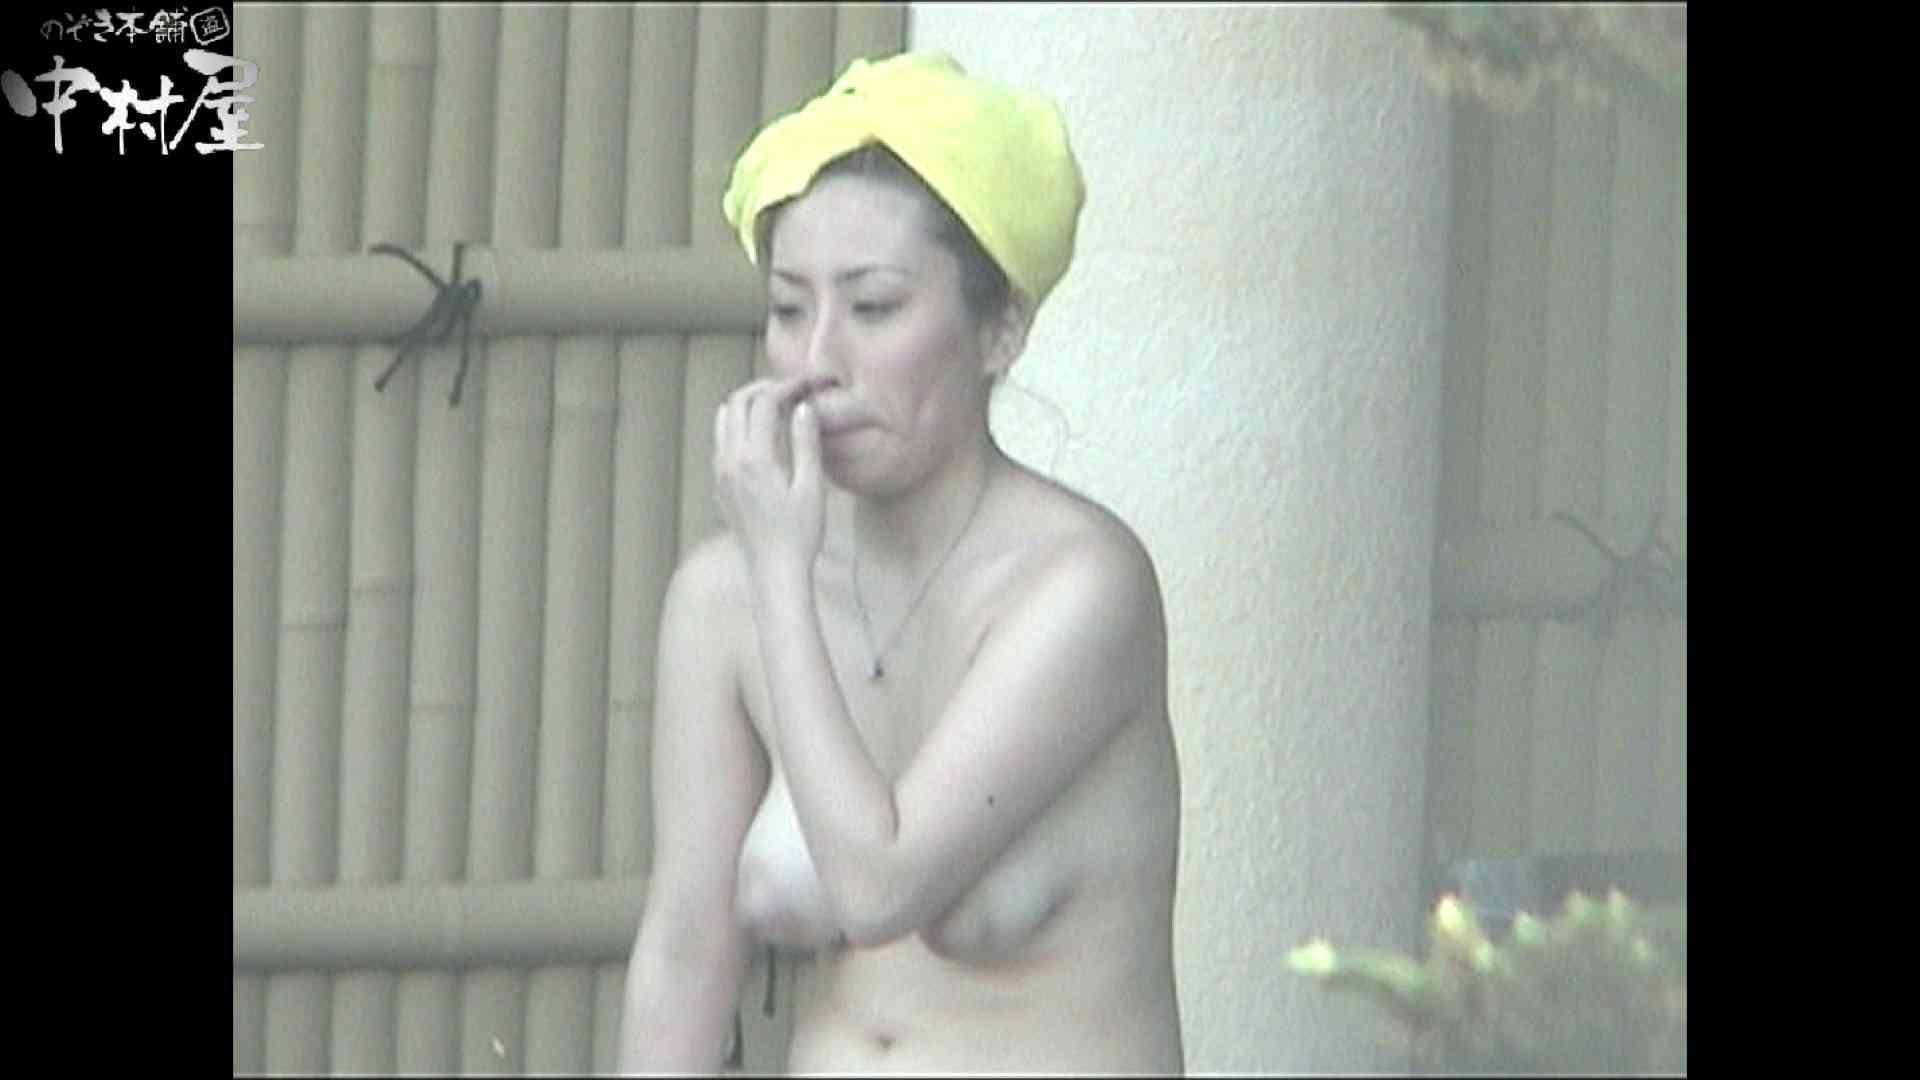 Aquaな露天風呂Vol.902 盗撮師作品 | 露天風呂突入  104pic 100